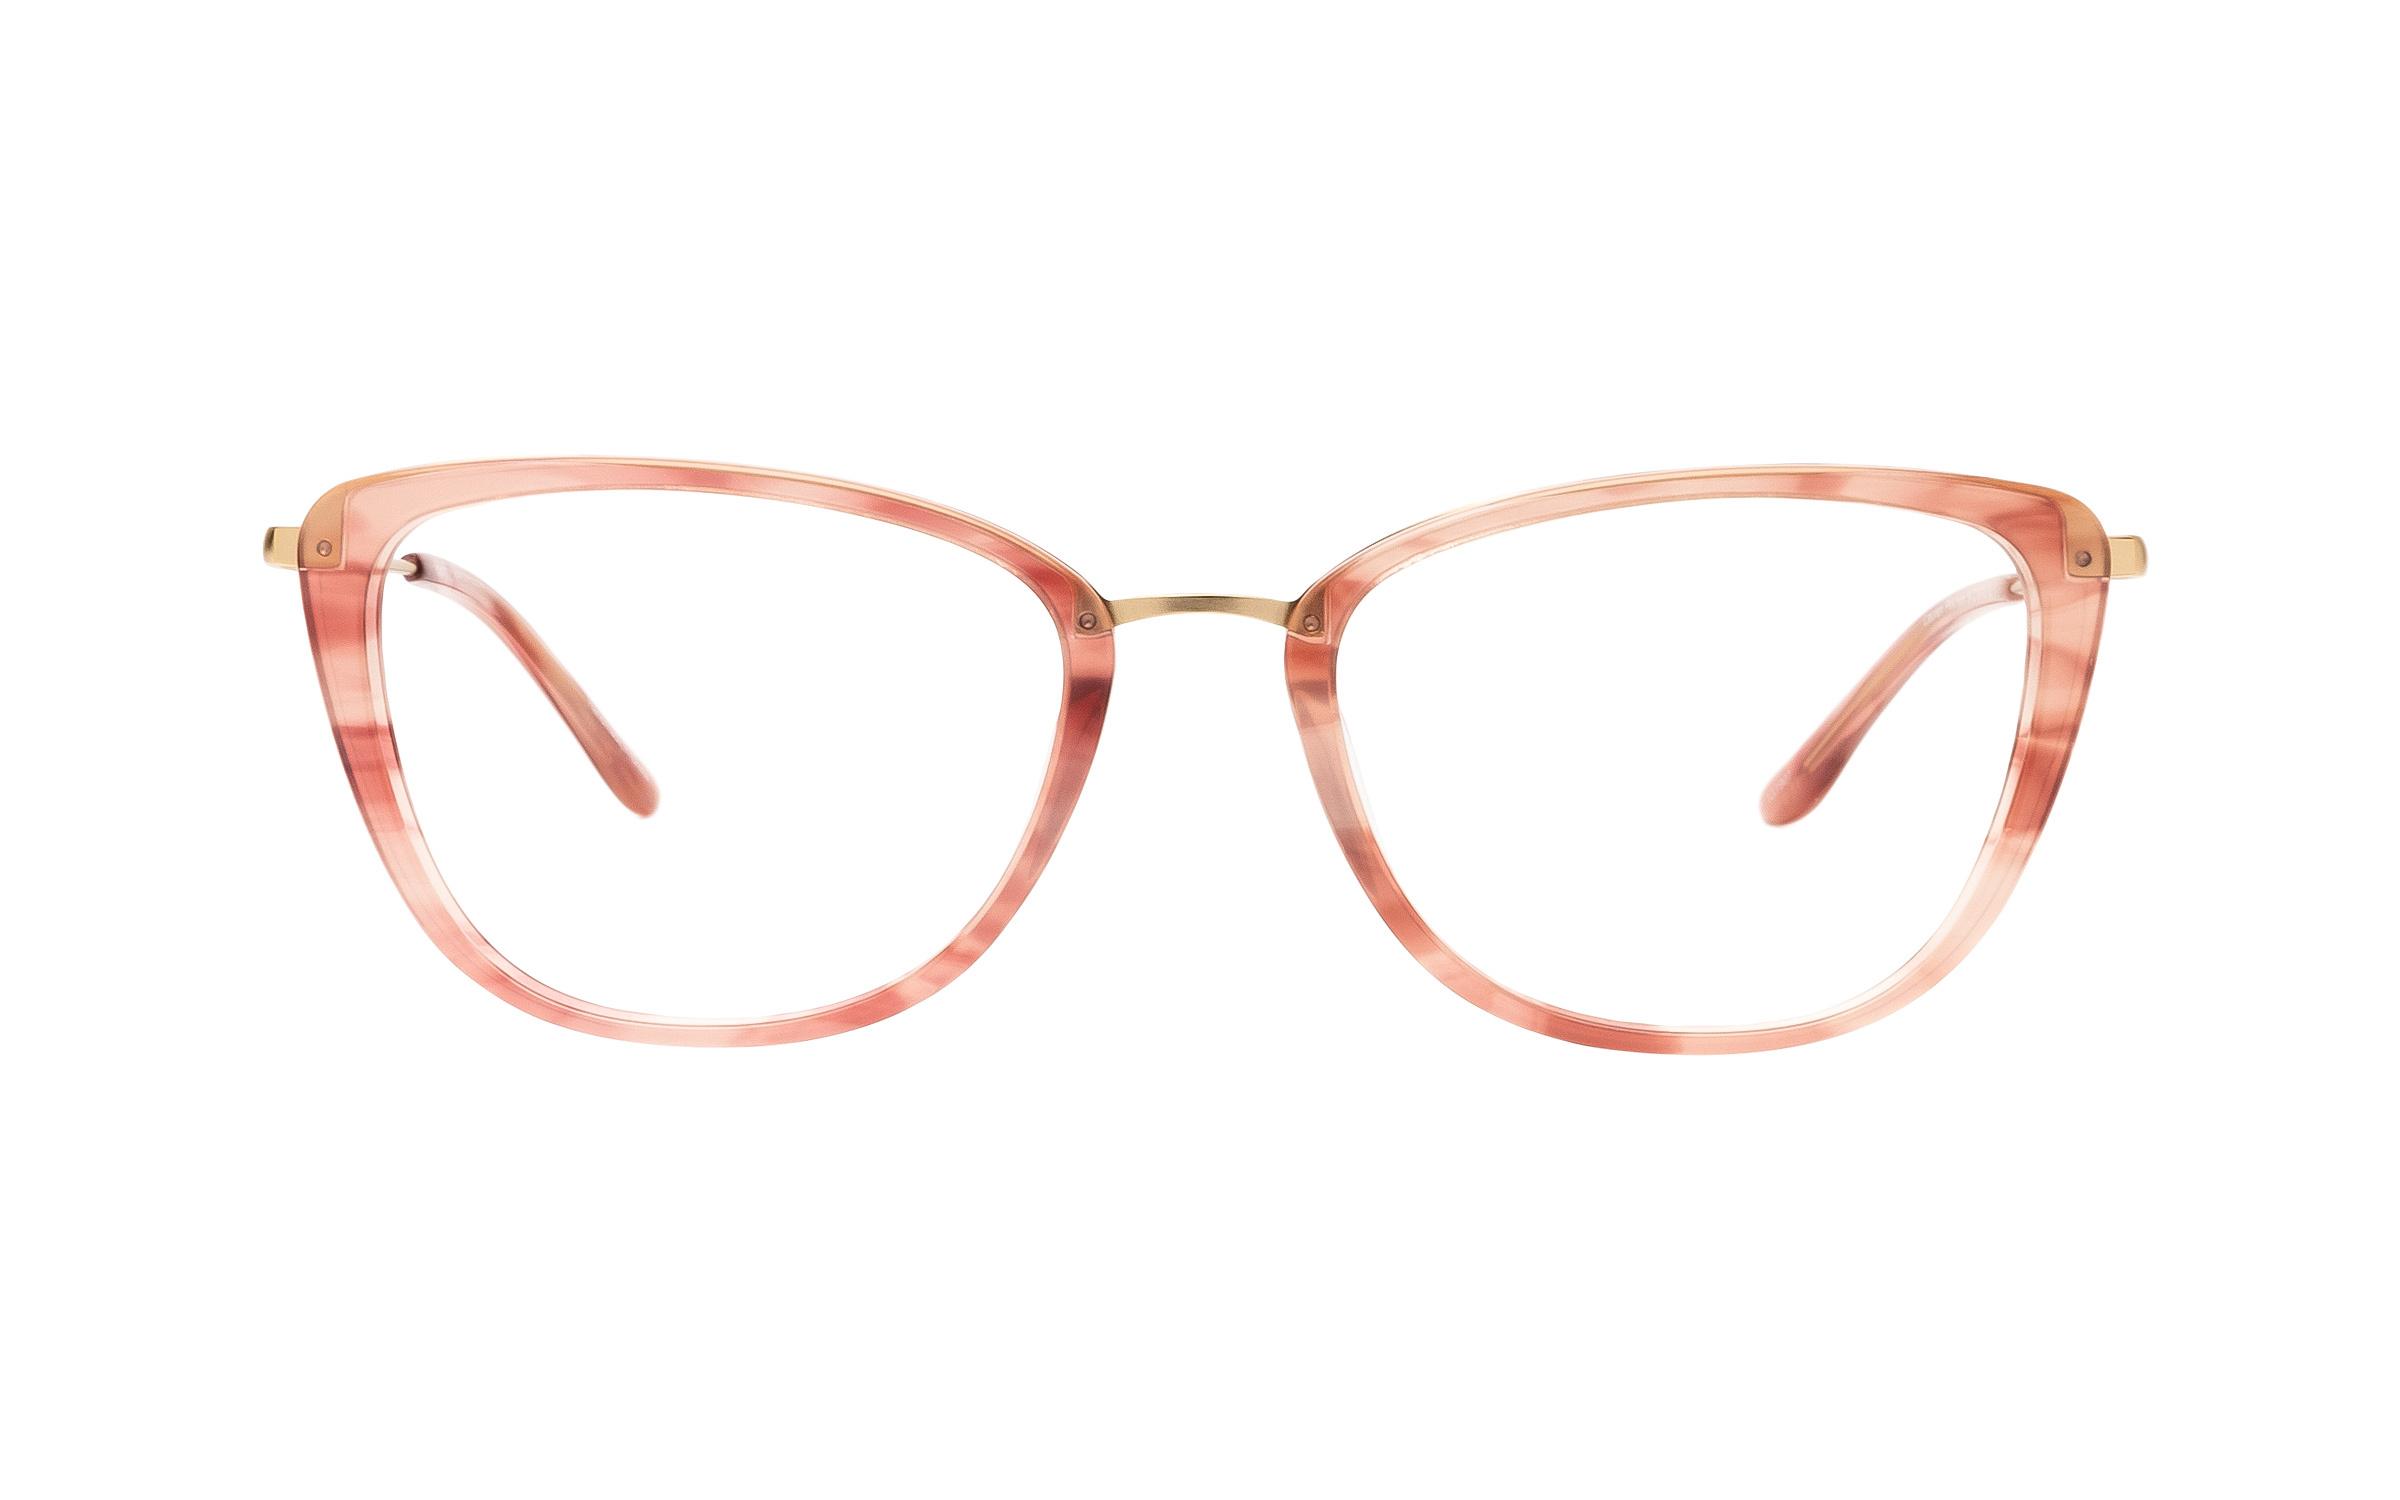 Kam Dhillon Lauren (54) Eyeglasses and Frame in Horn Pink | Acetate/Metal - Online Coastal